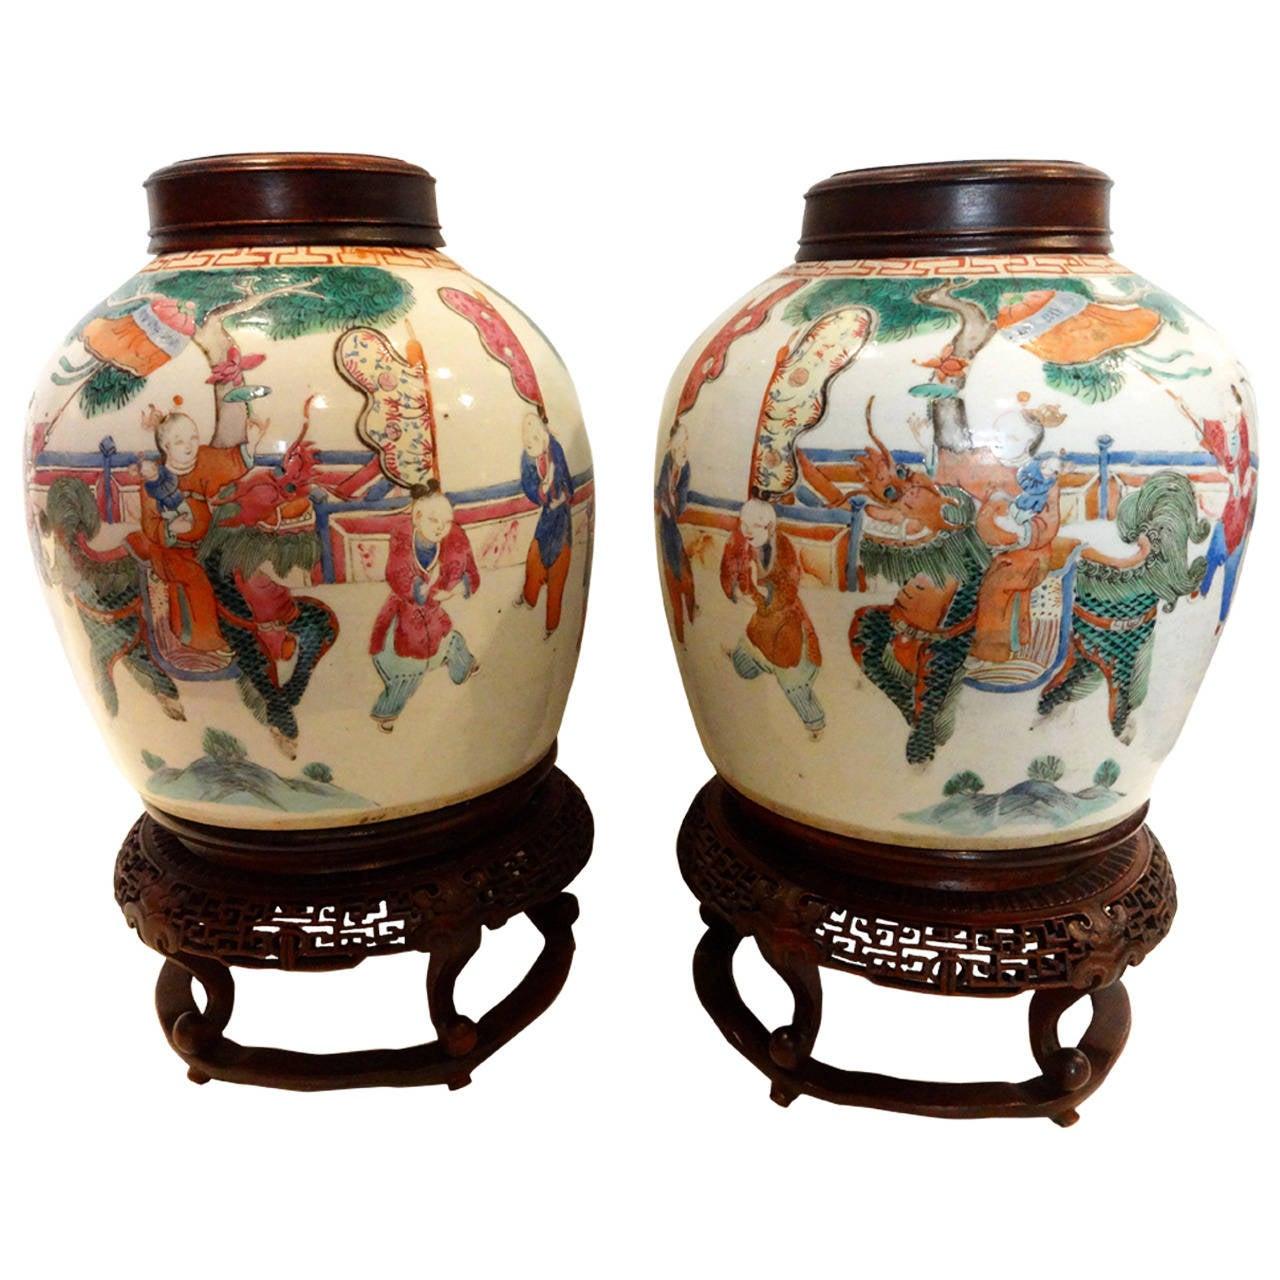 Chinese Ginger Jars Pair Chinese Famille Rose Ginger Jars At 1stdibs